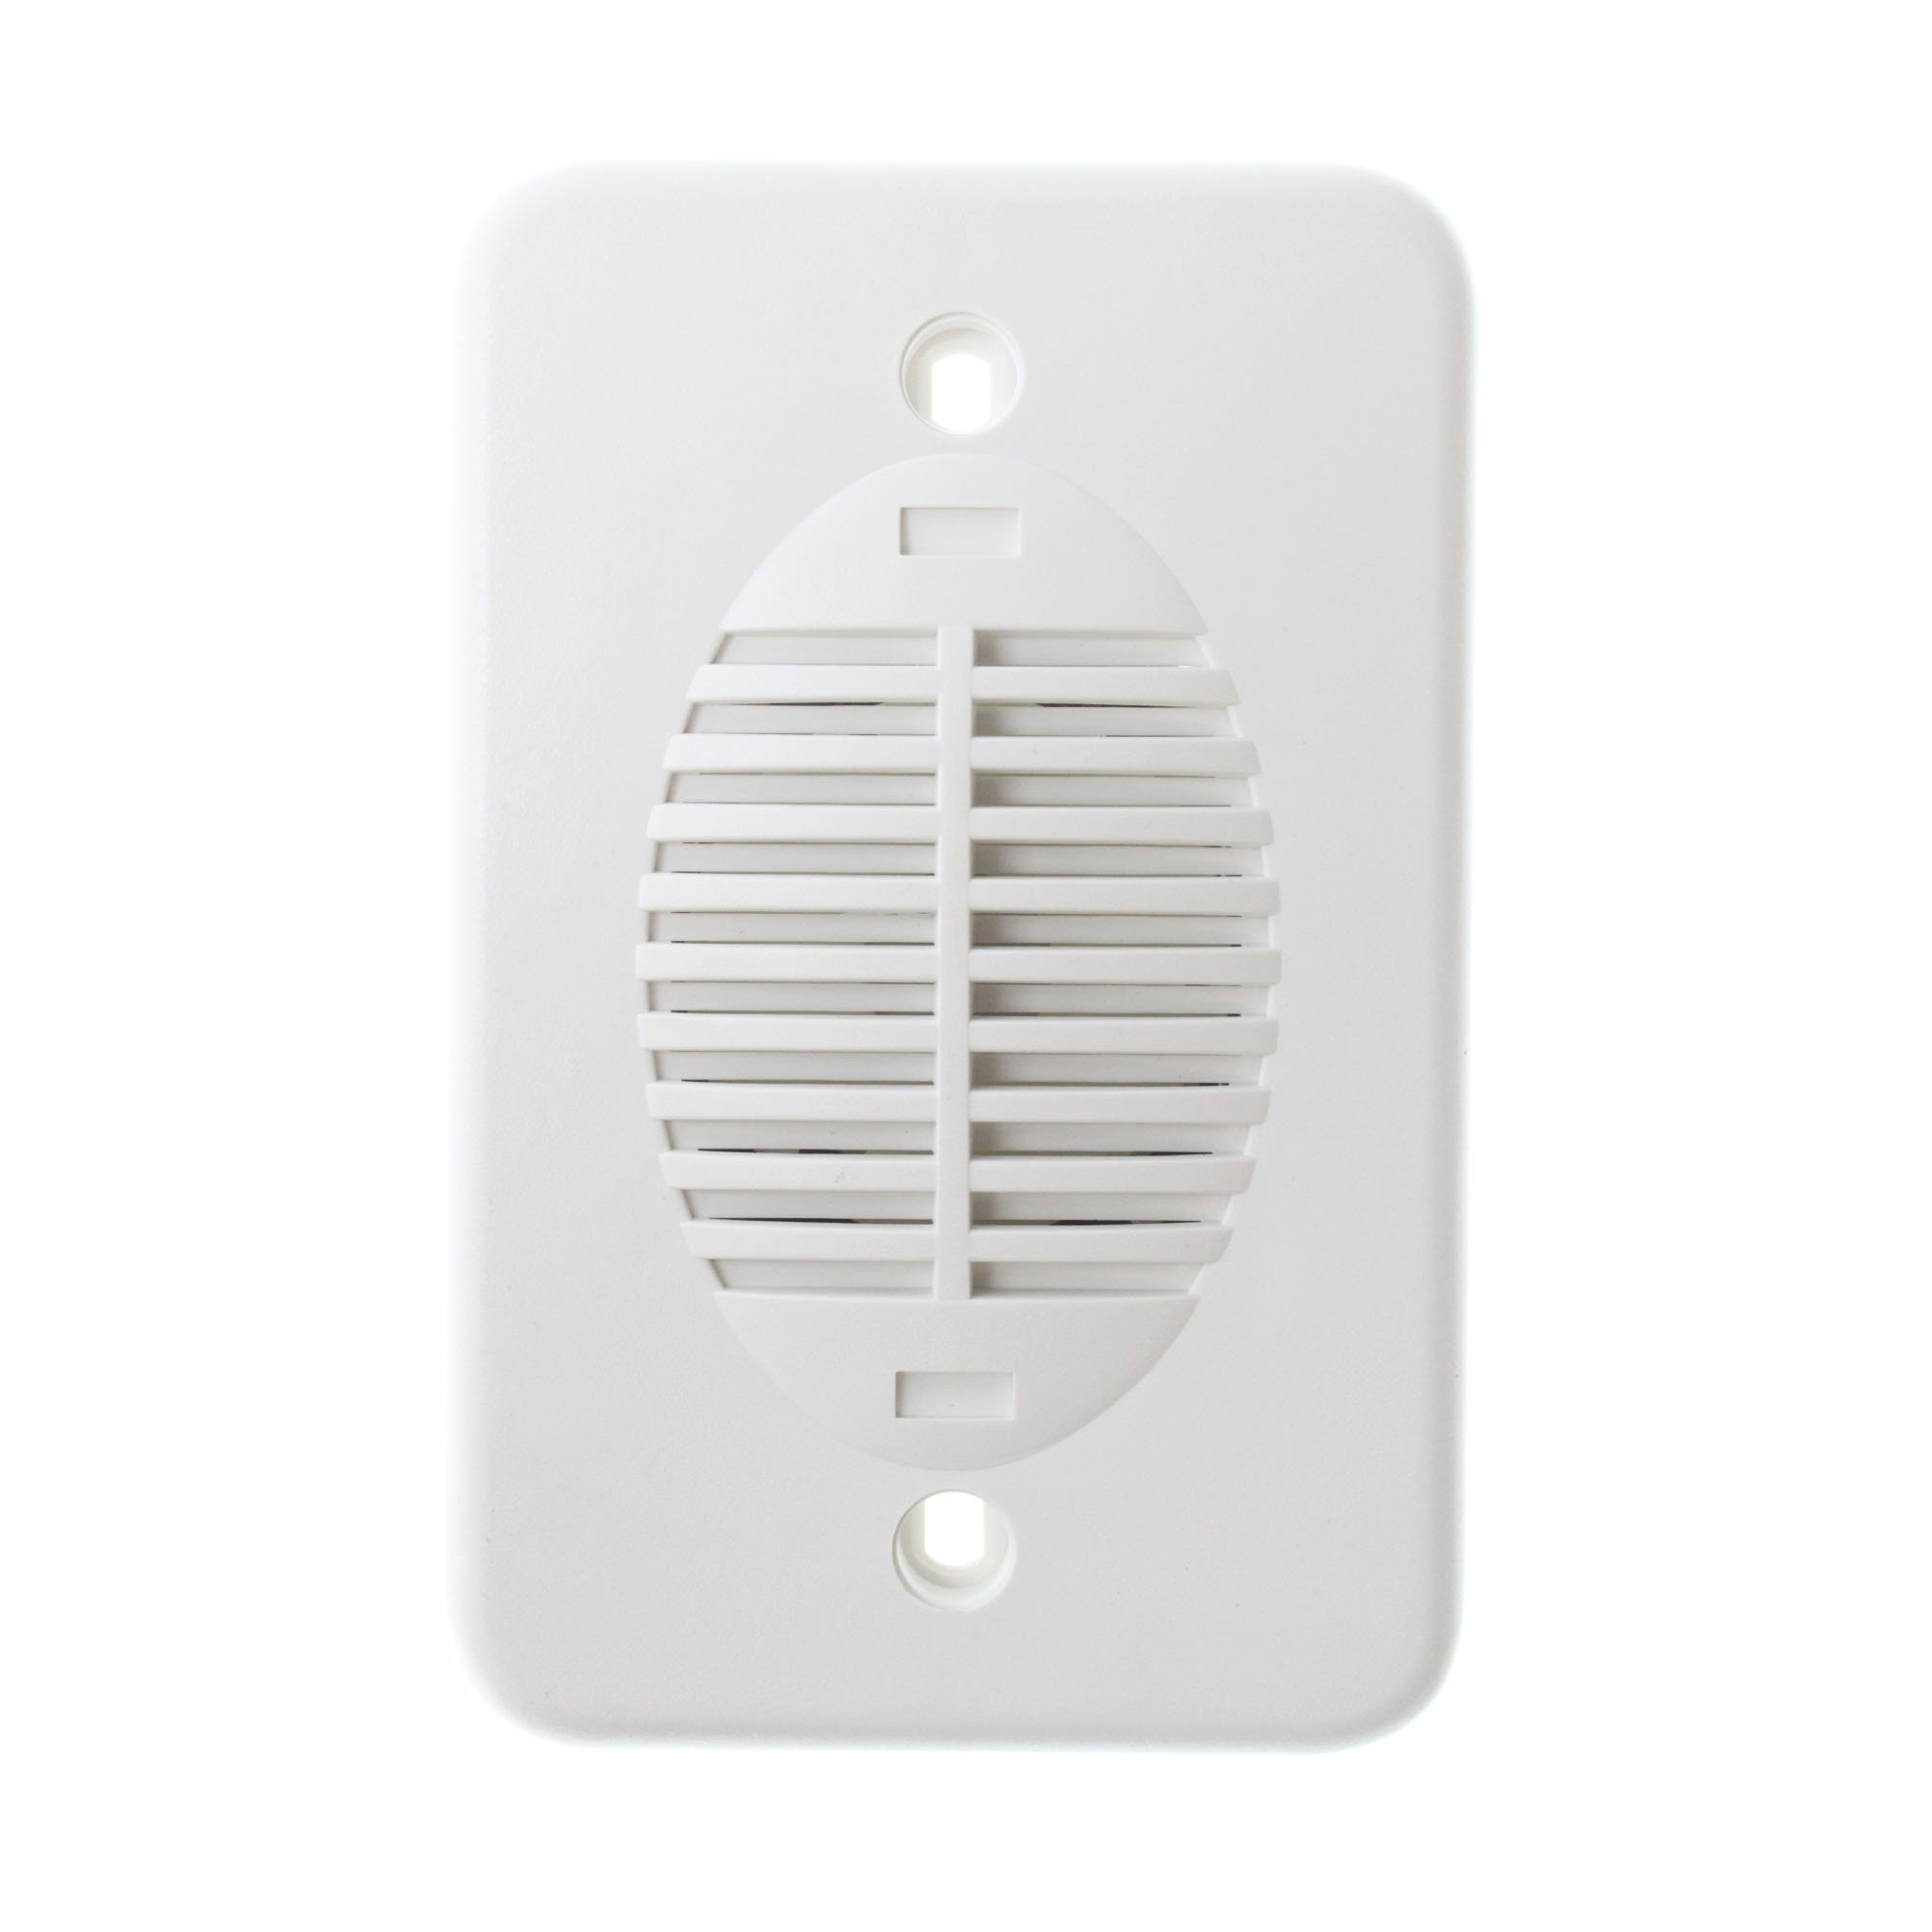 ATW Security SGST-W Single Gang Single Tone Piezo Siren, 105DB, 24VDC